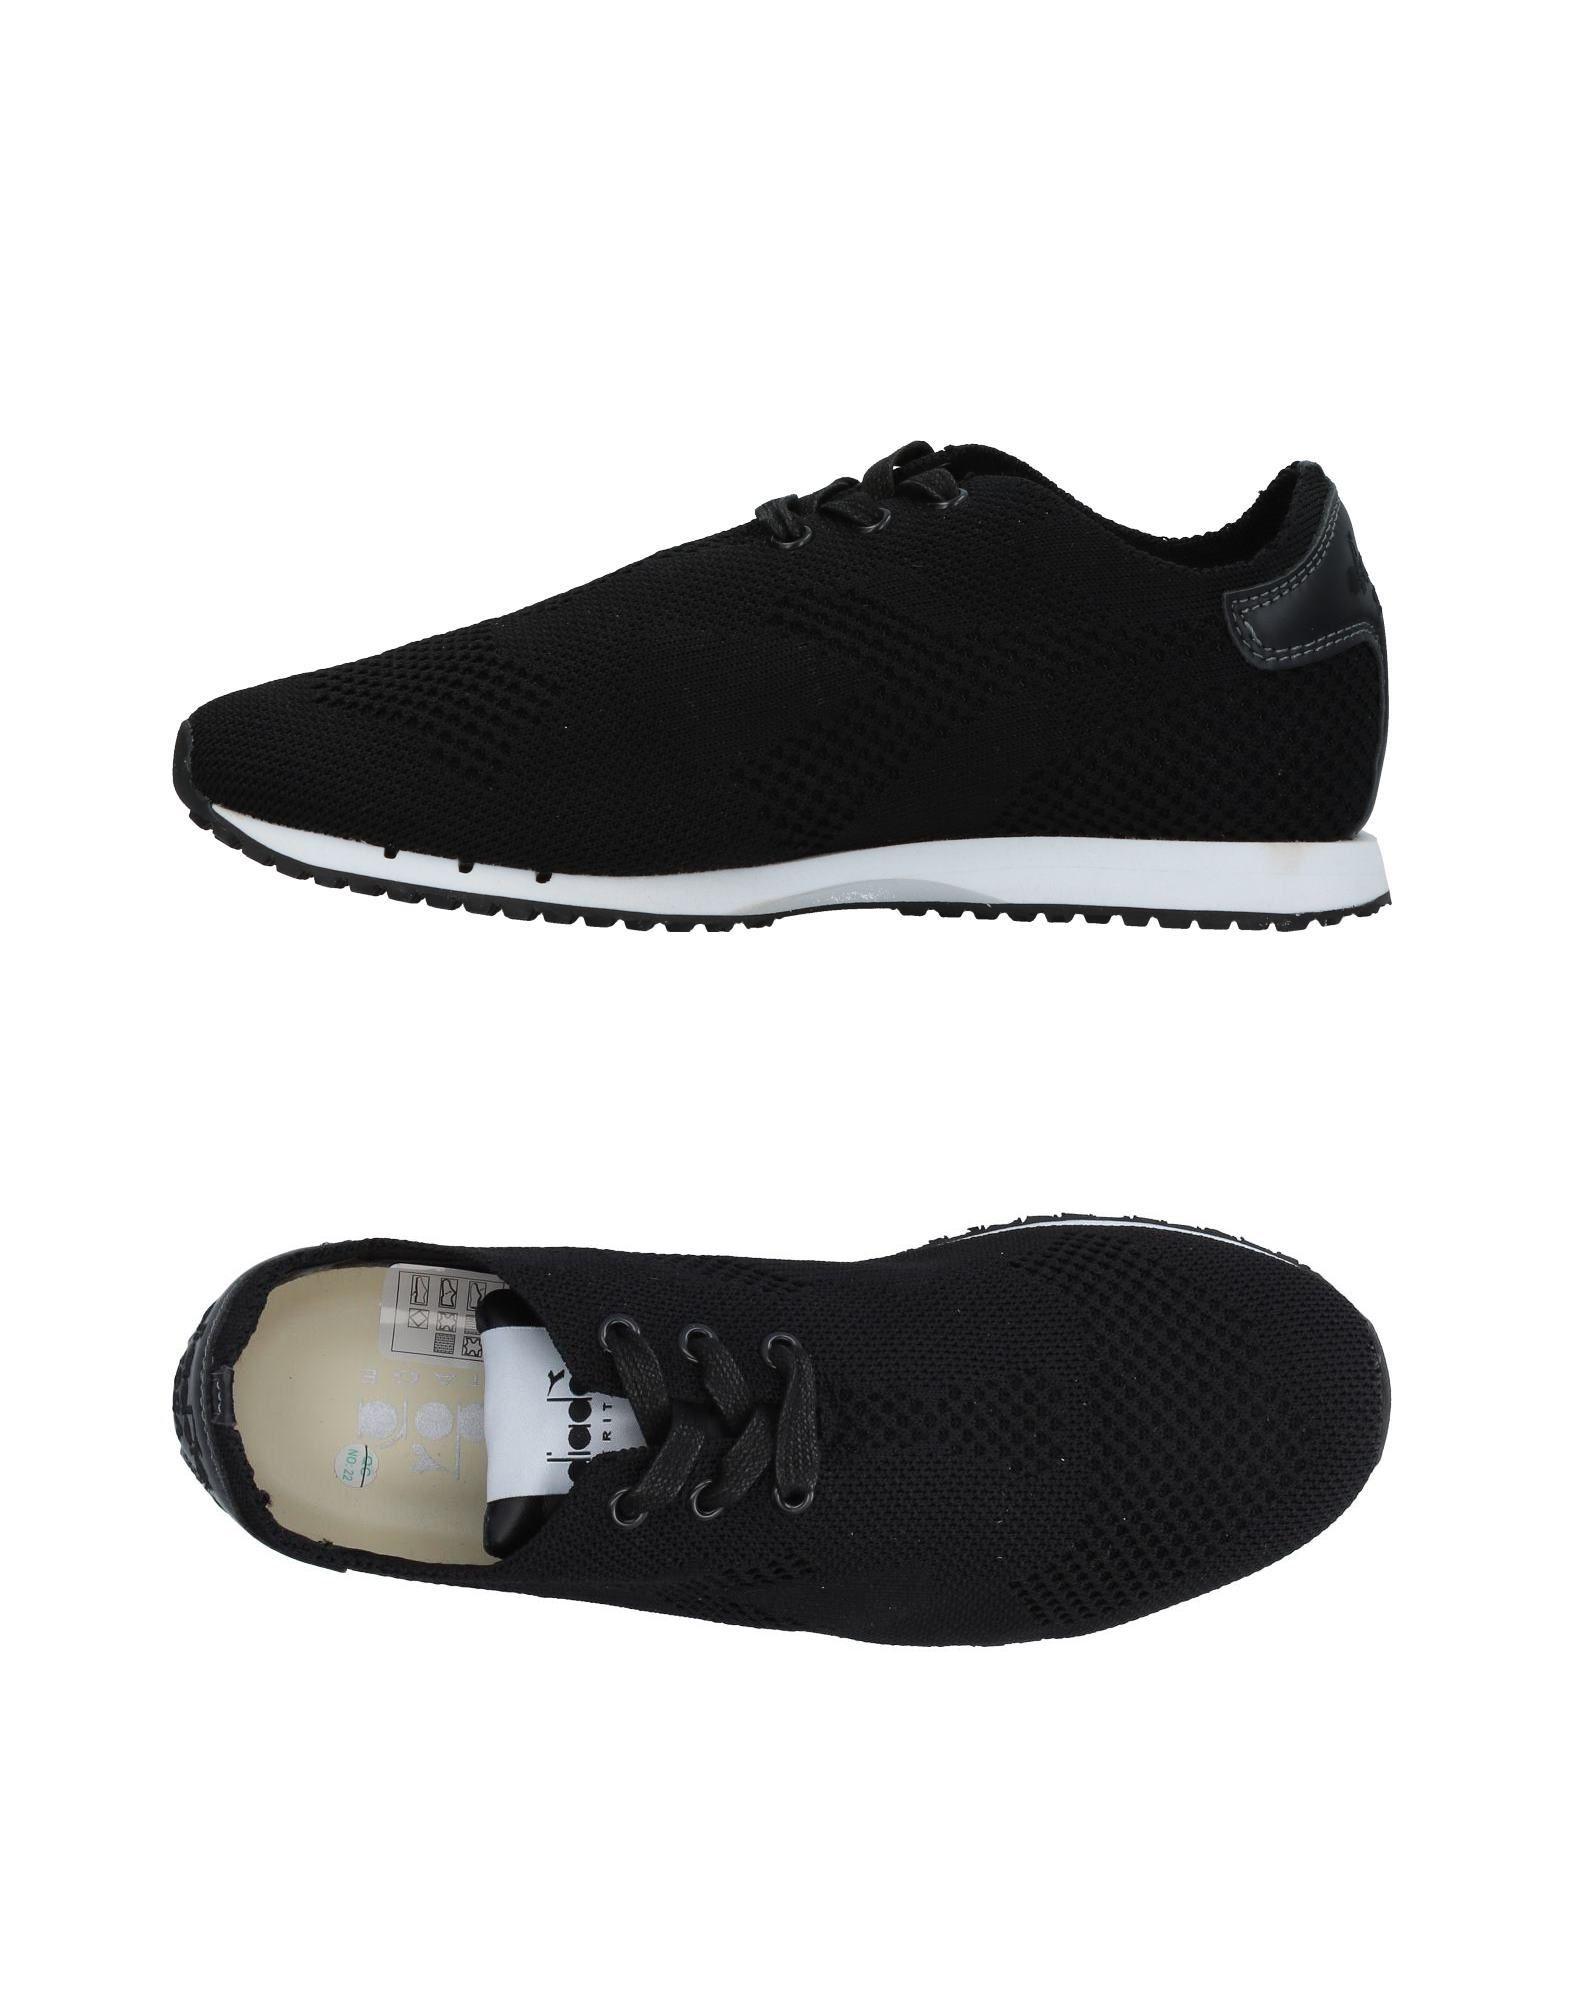 Diadora Heritage Sneakers - Men Diadora Heritage Sneakers - online on  Australia - Sneakers 11343652EC 4b1c12